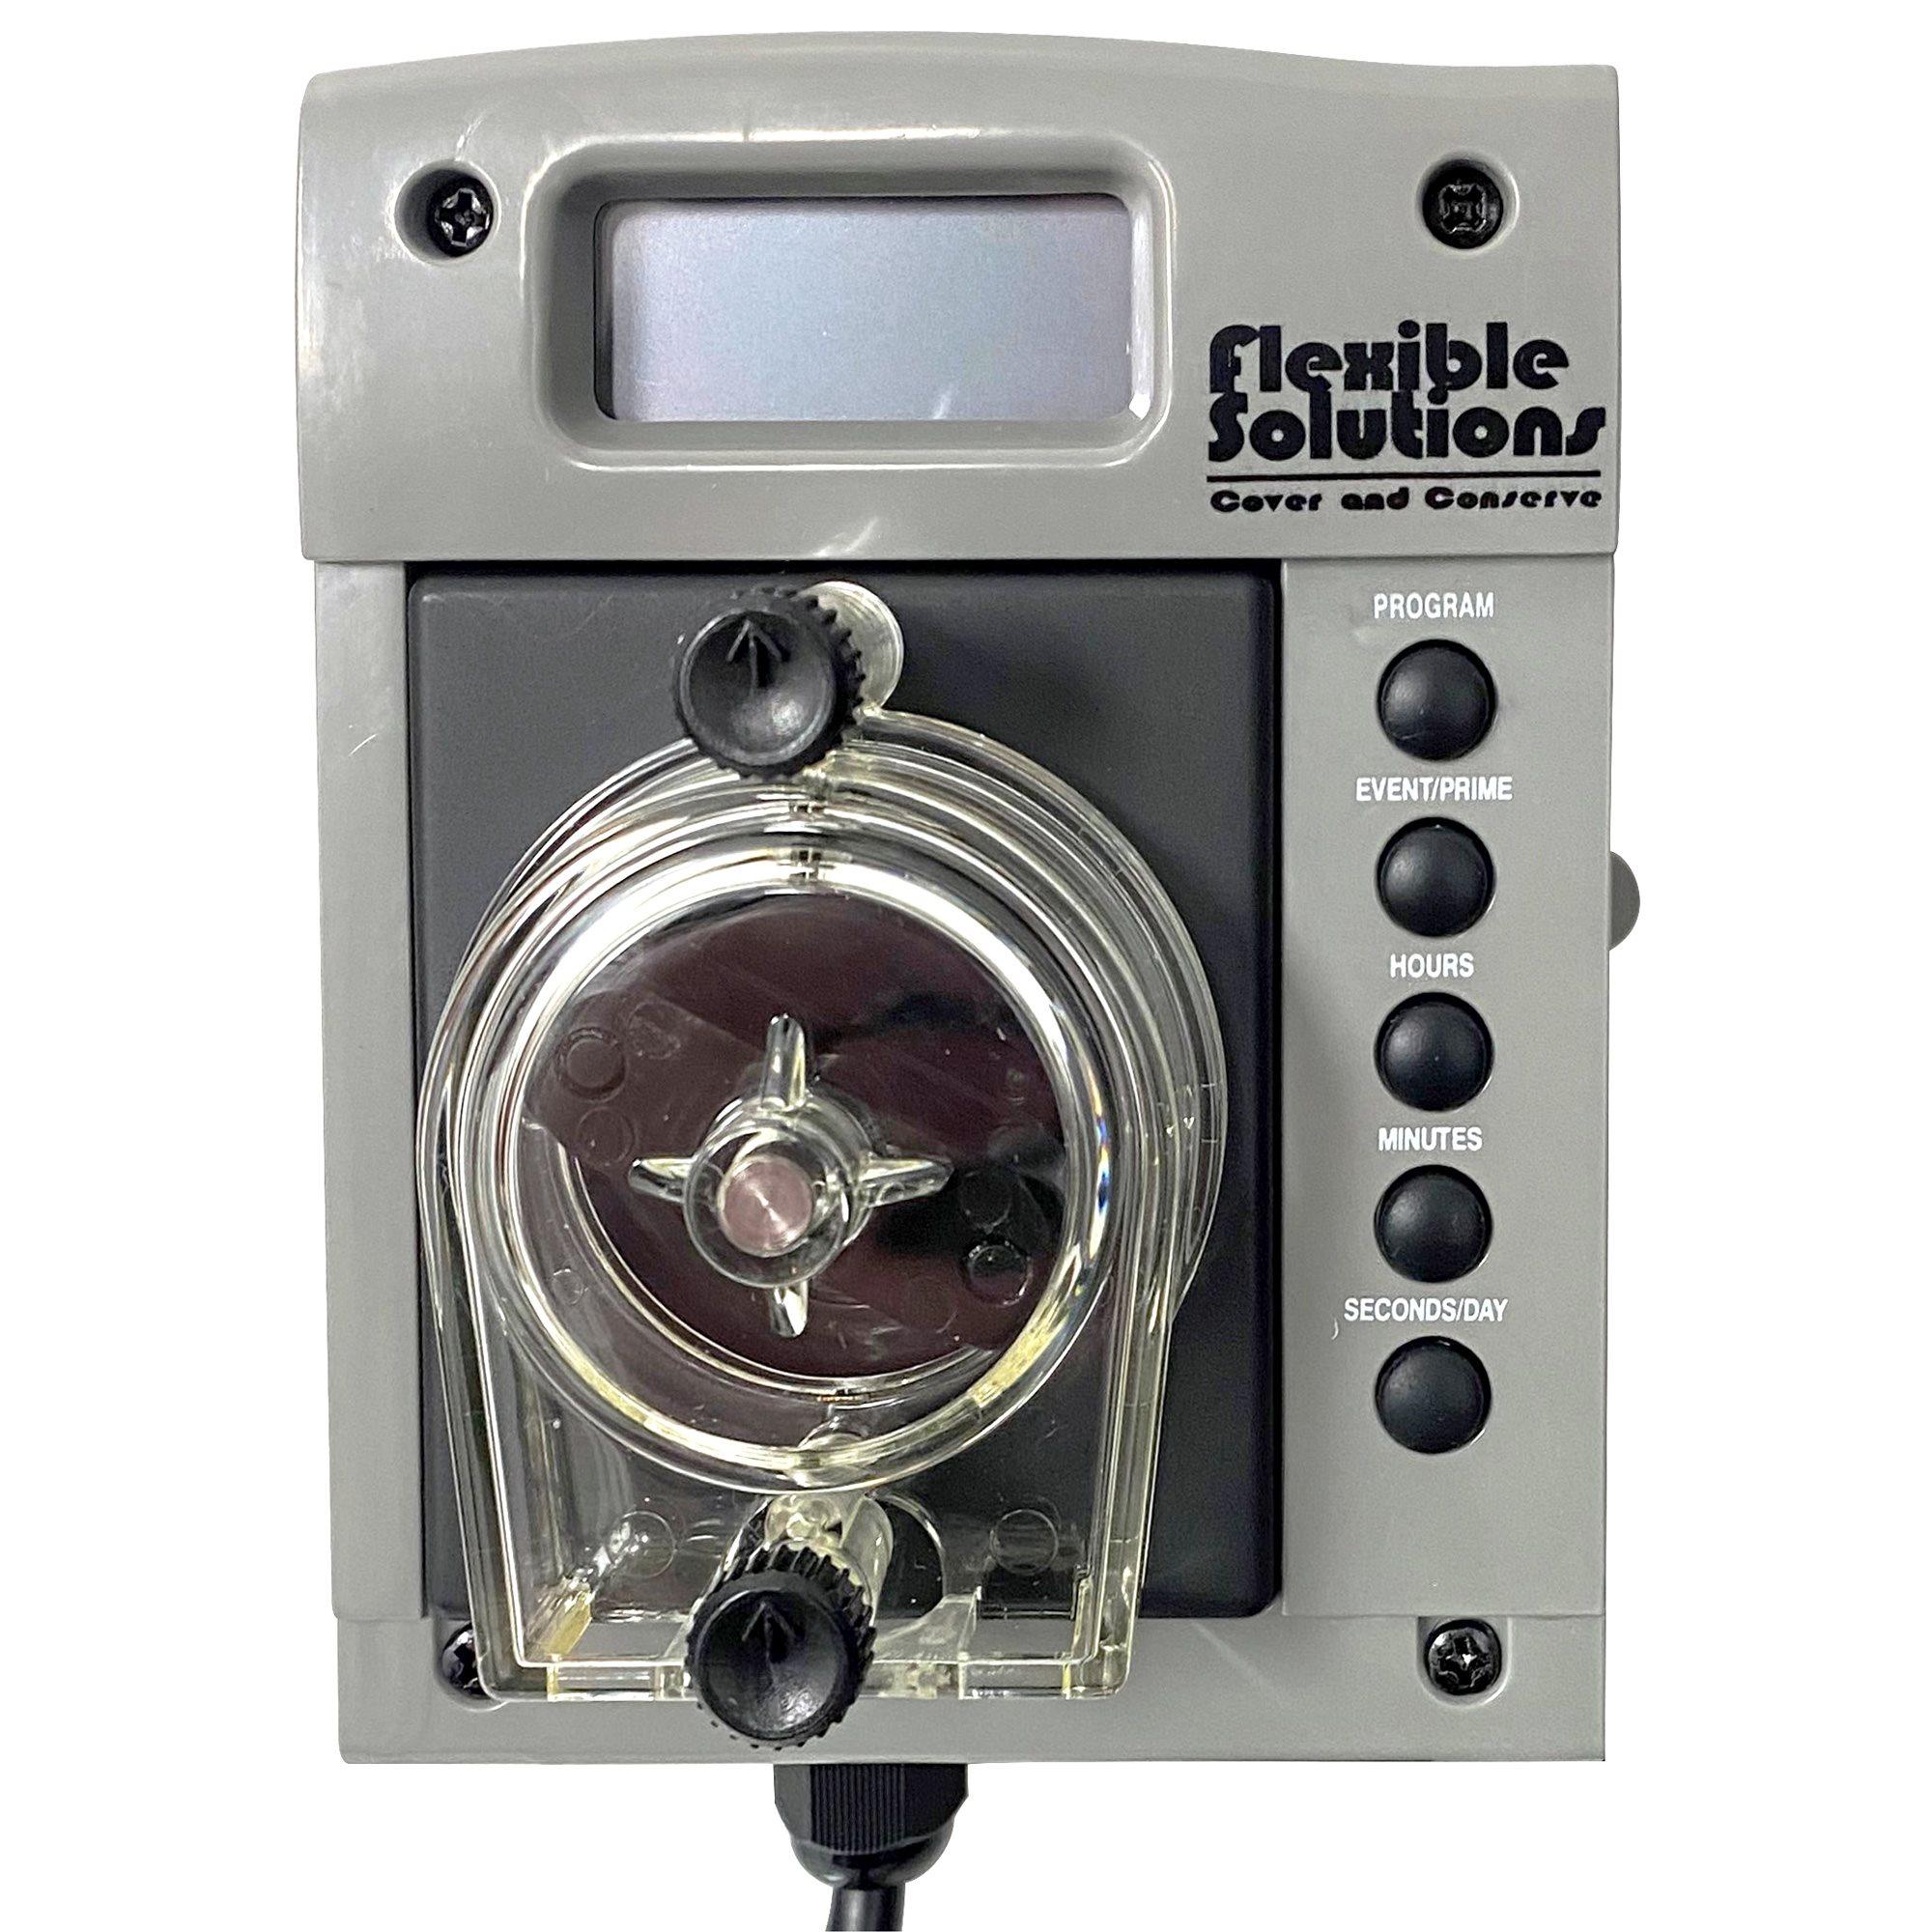 Metering Pump For Heatsavr Liquid Pool Cover